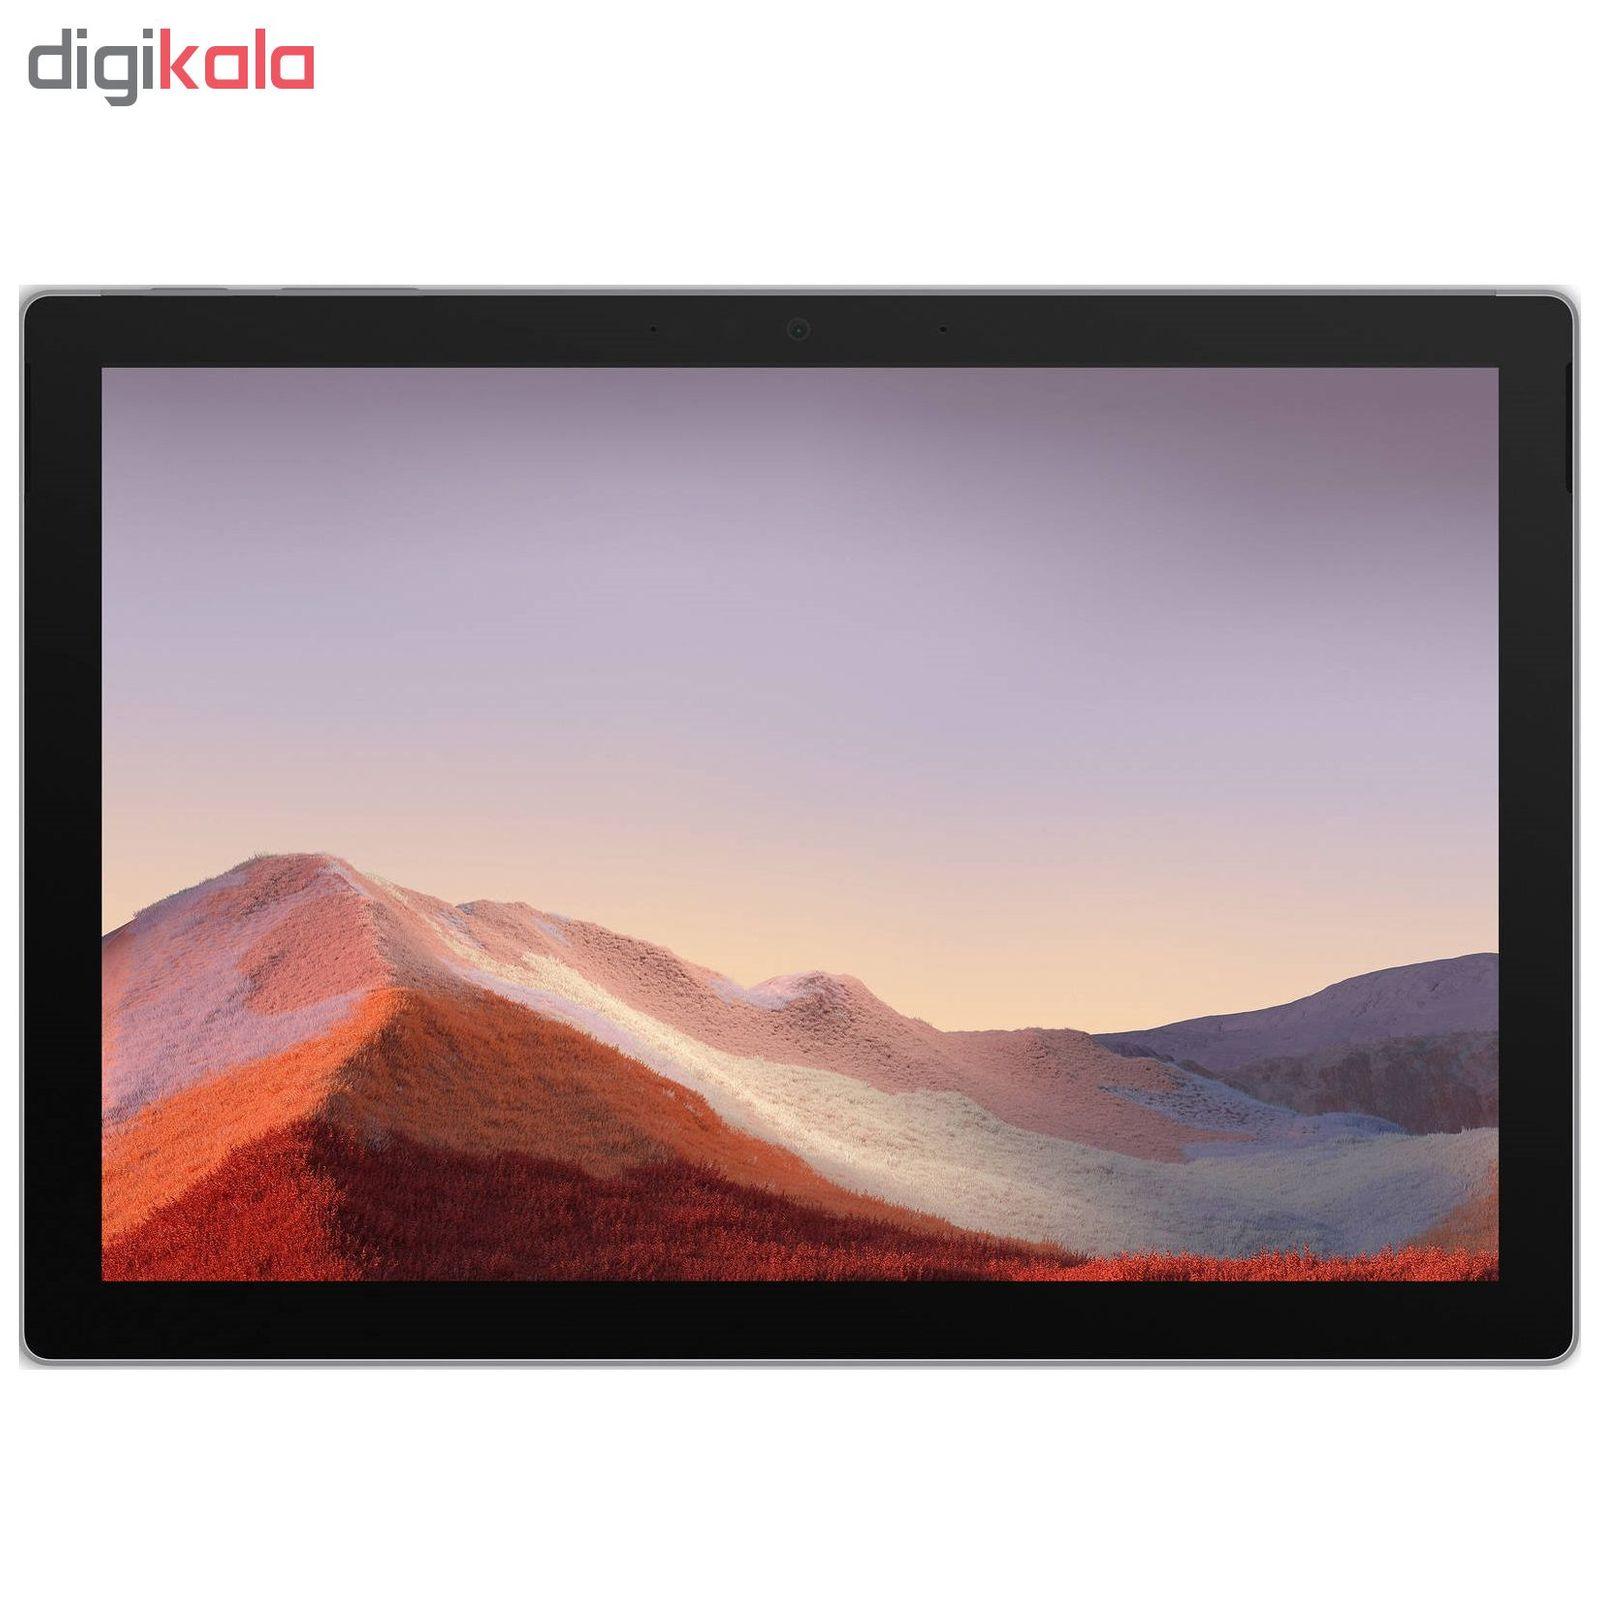 تبلت مایکروسافت مدل Surface Pro 7 - B به همراه کیبورد Black Type Cover main 1 4